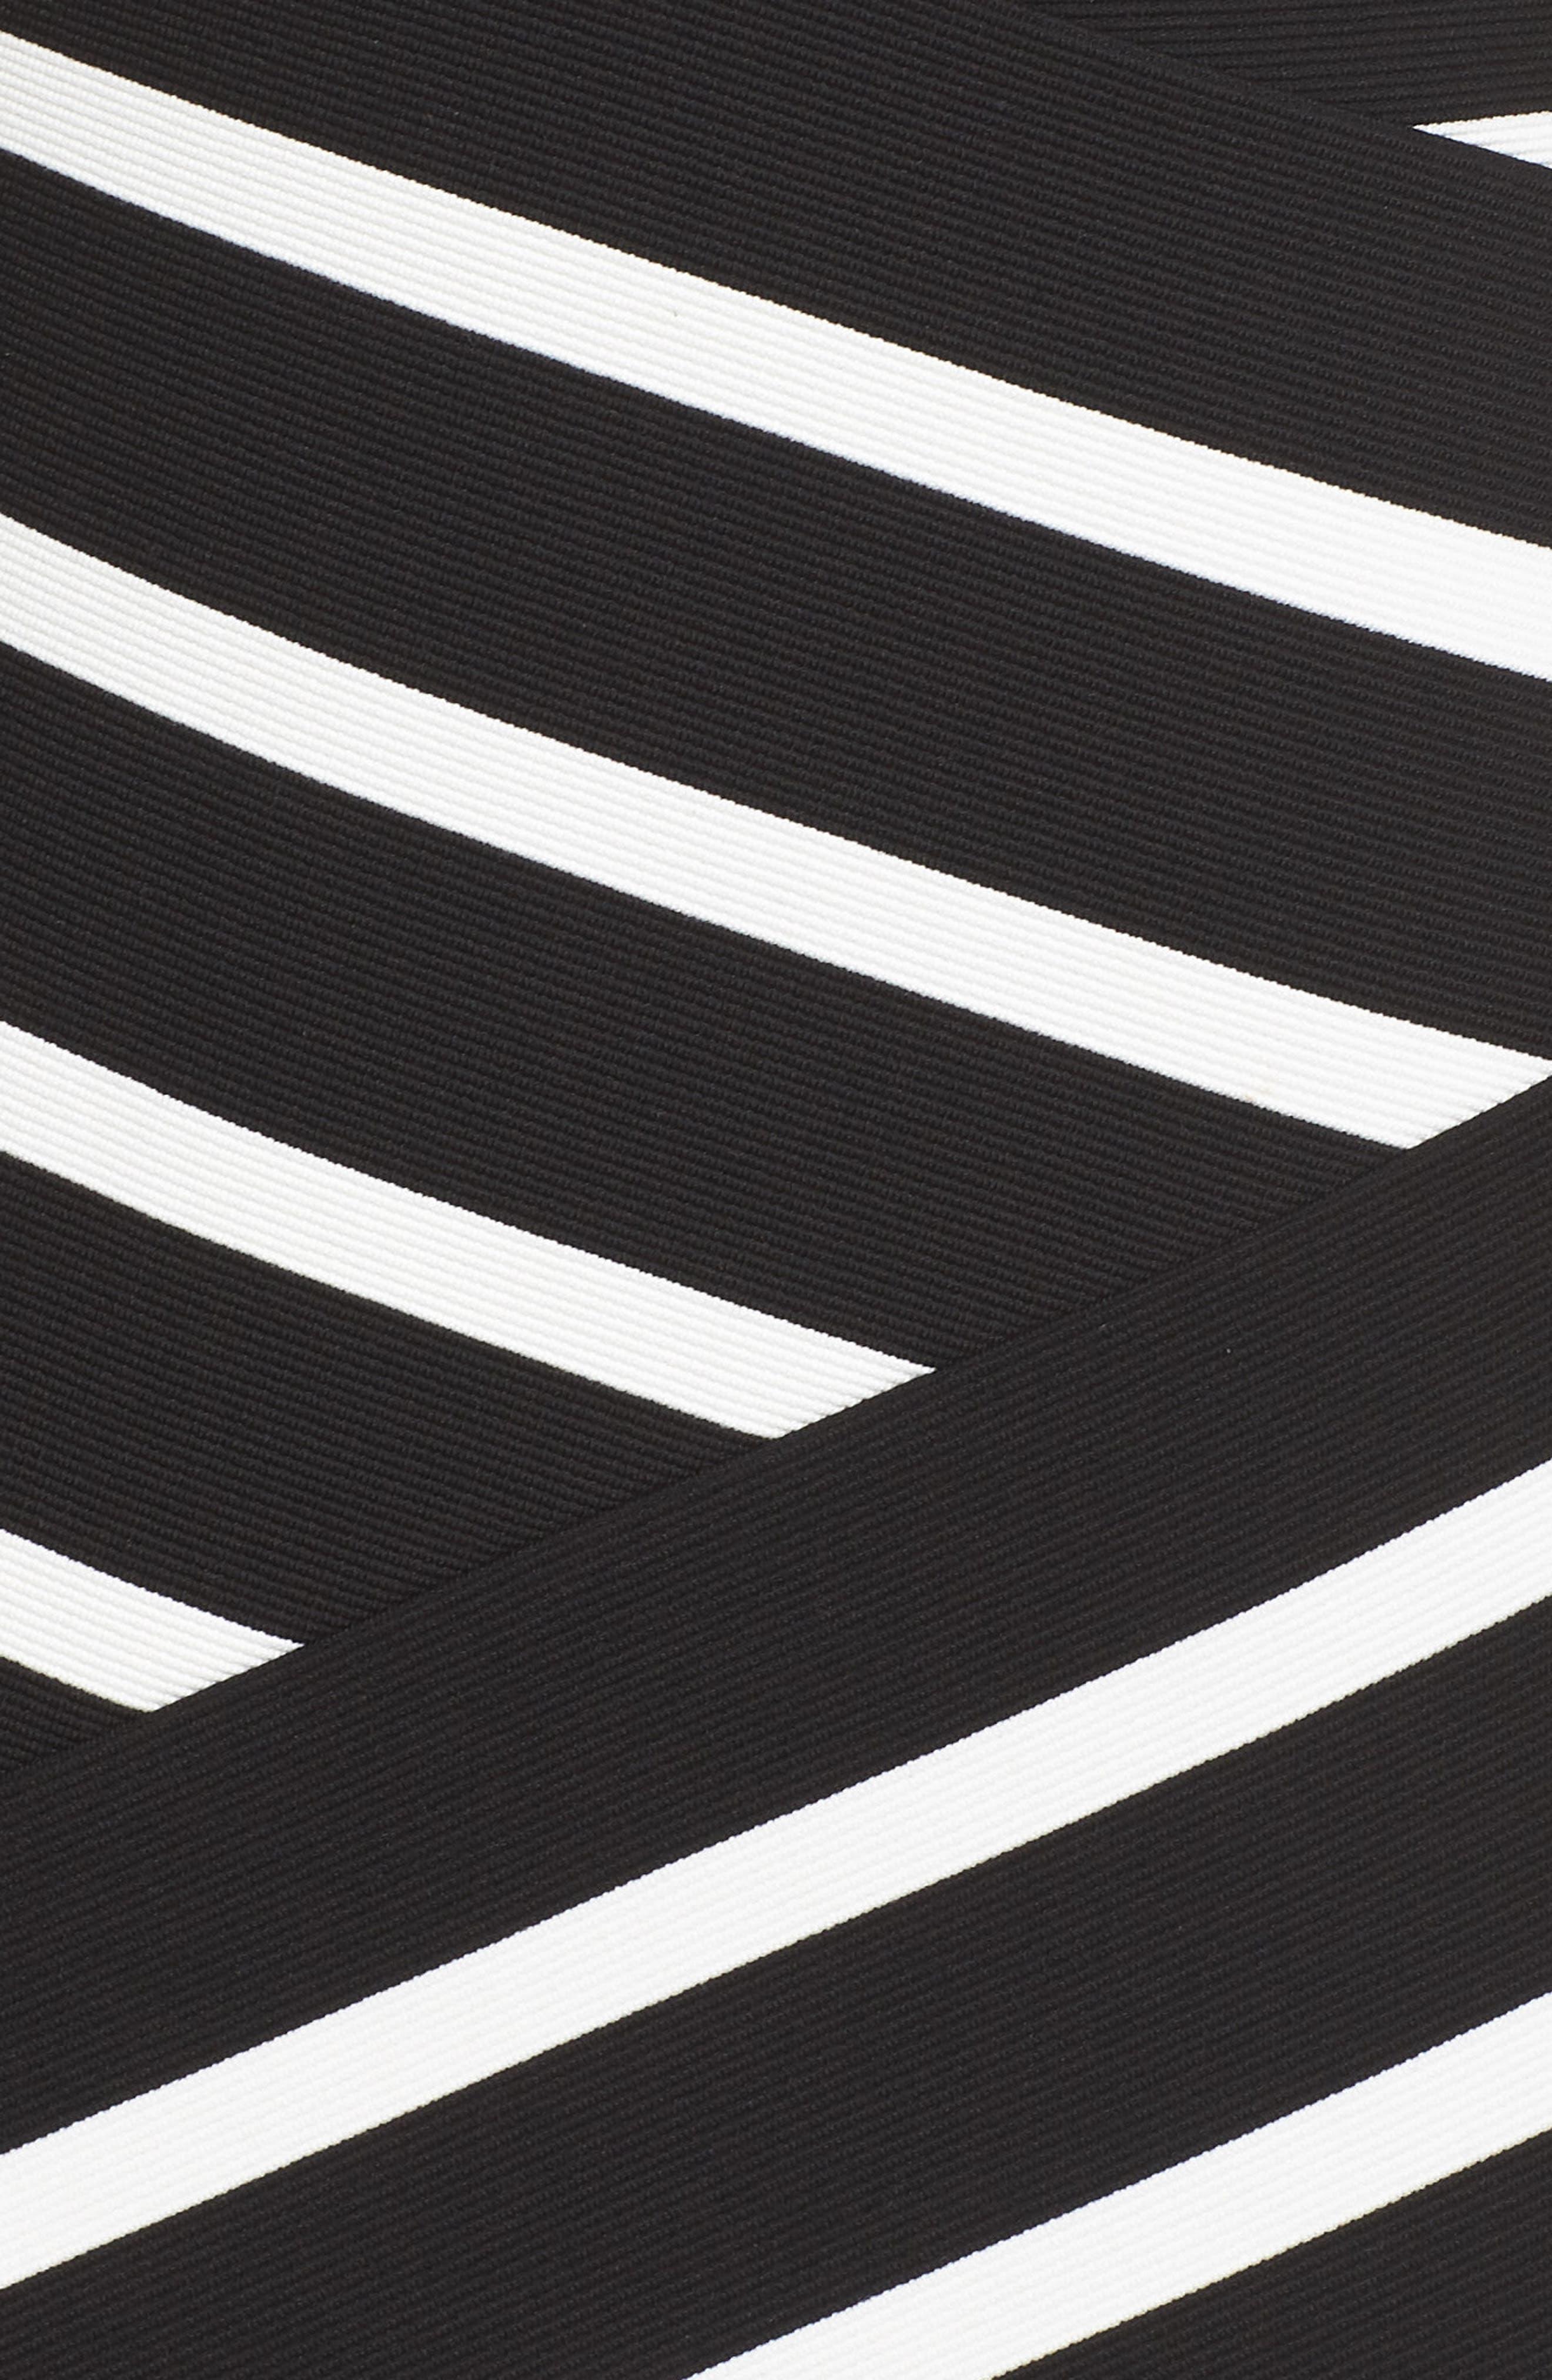 Ottoman Striped Sheath Dress,                             Alternate thumbnail 5, color,                             Black/ Ivory